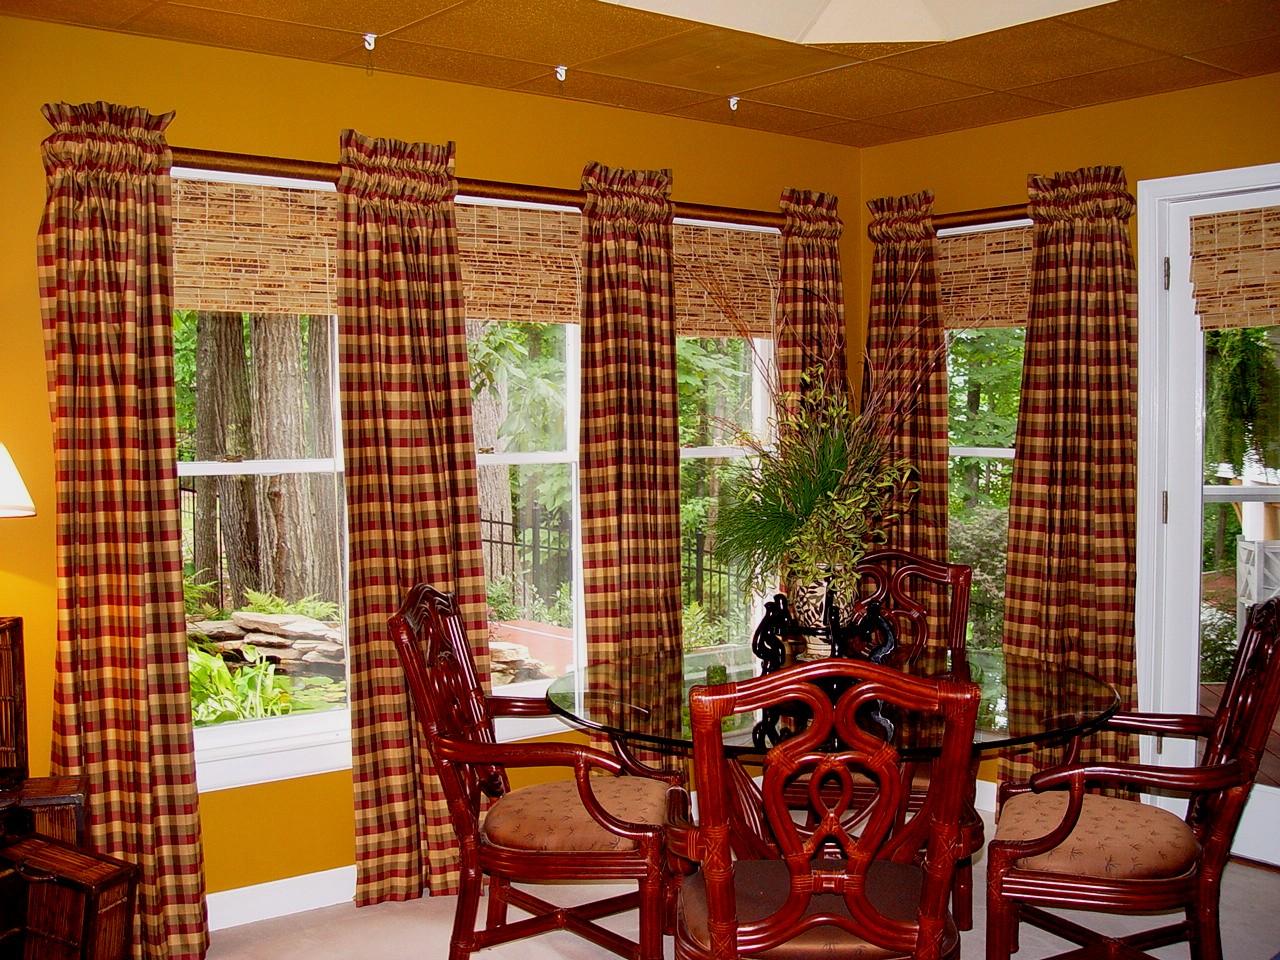 custom-blinds-drapery-shades-interior-design-atlanta-georgia-9.jpg